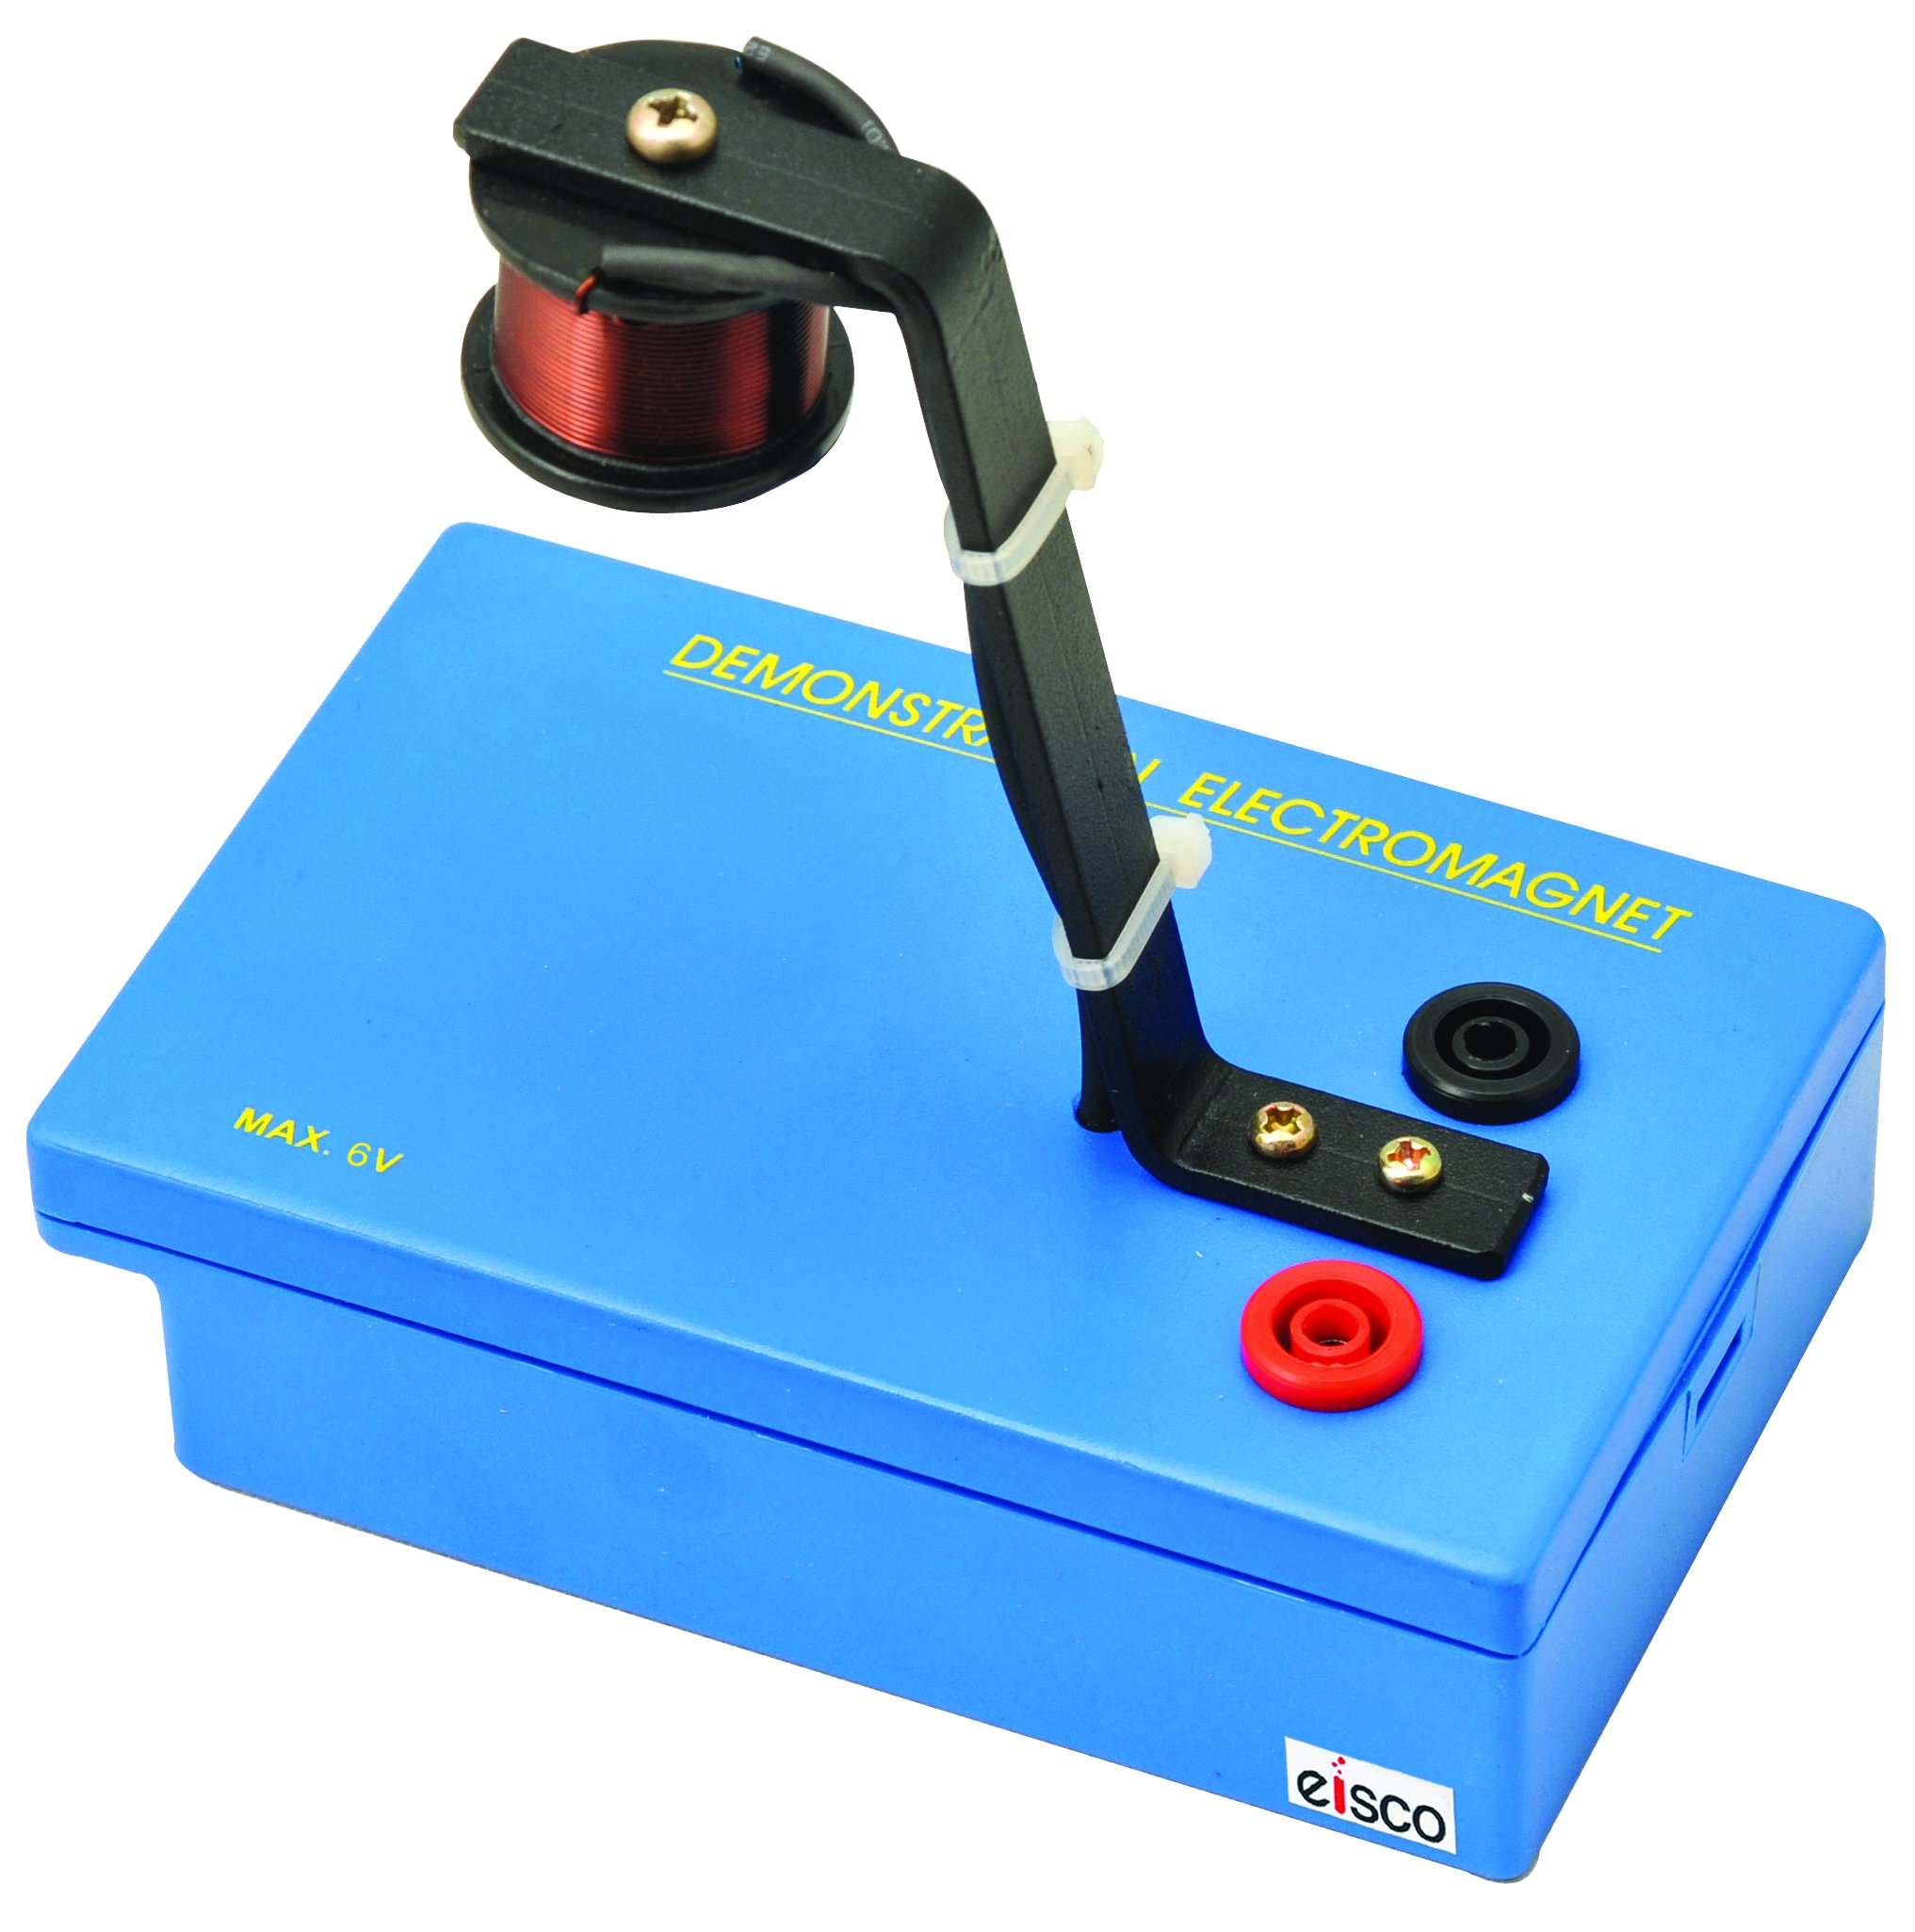 Eisco Labs Demonstration Electromagnet Max 6V